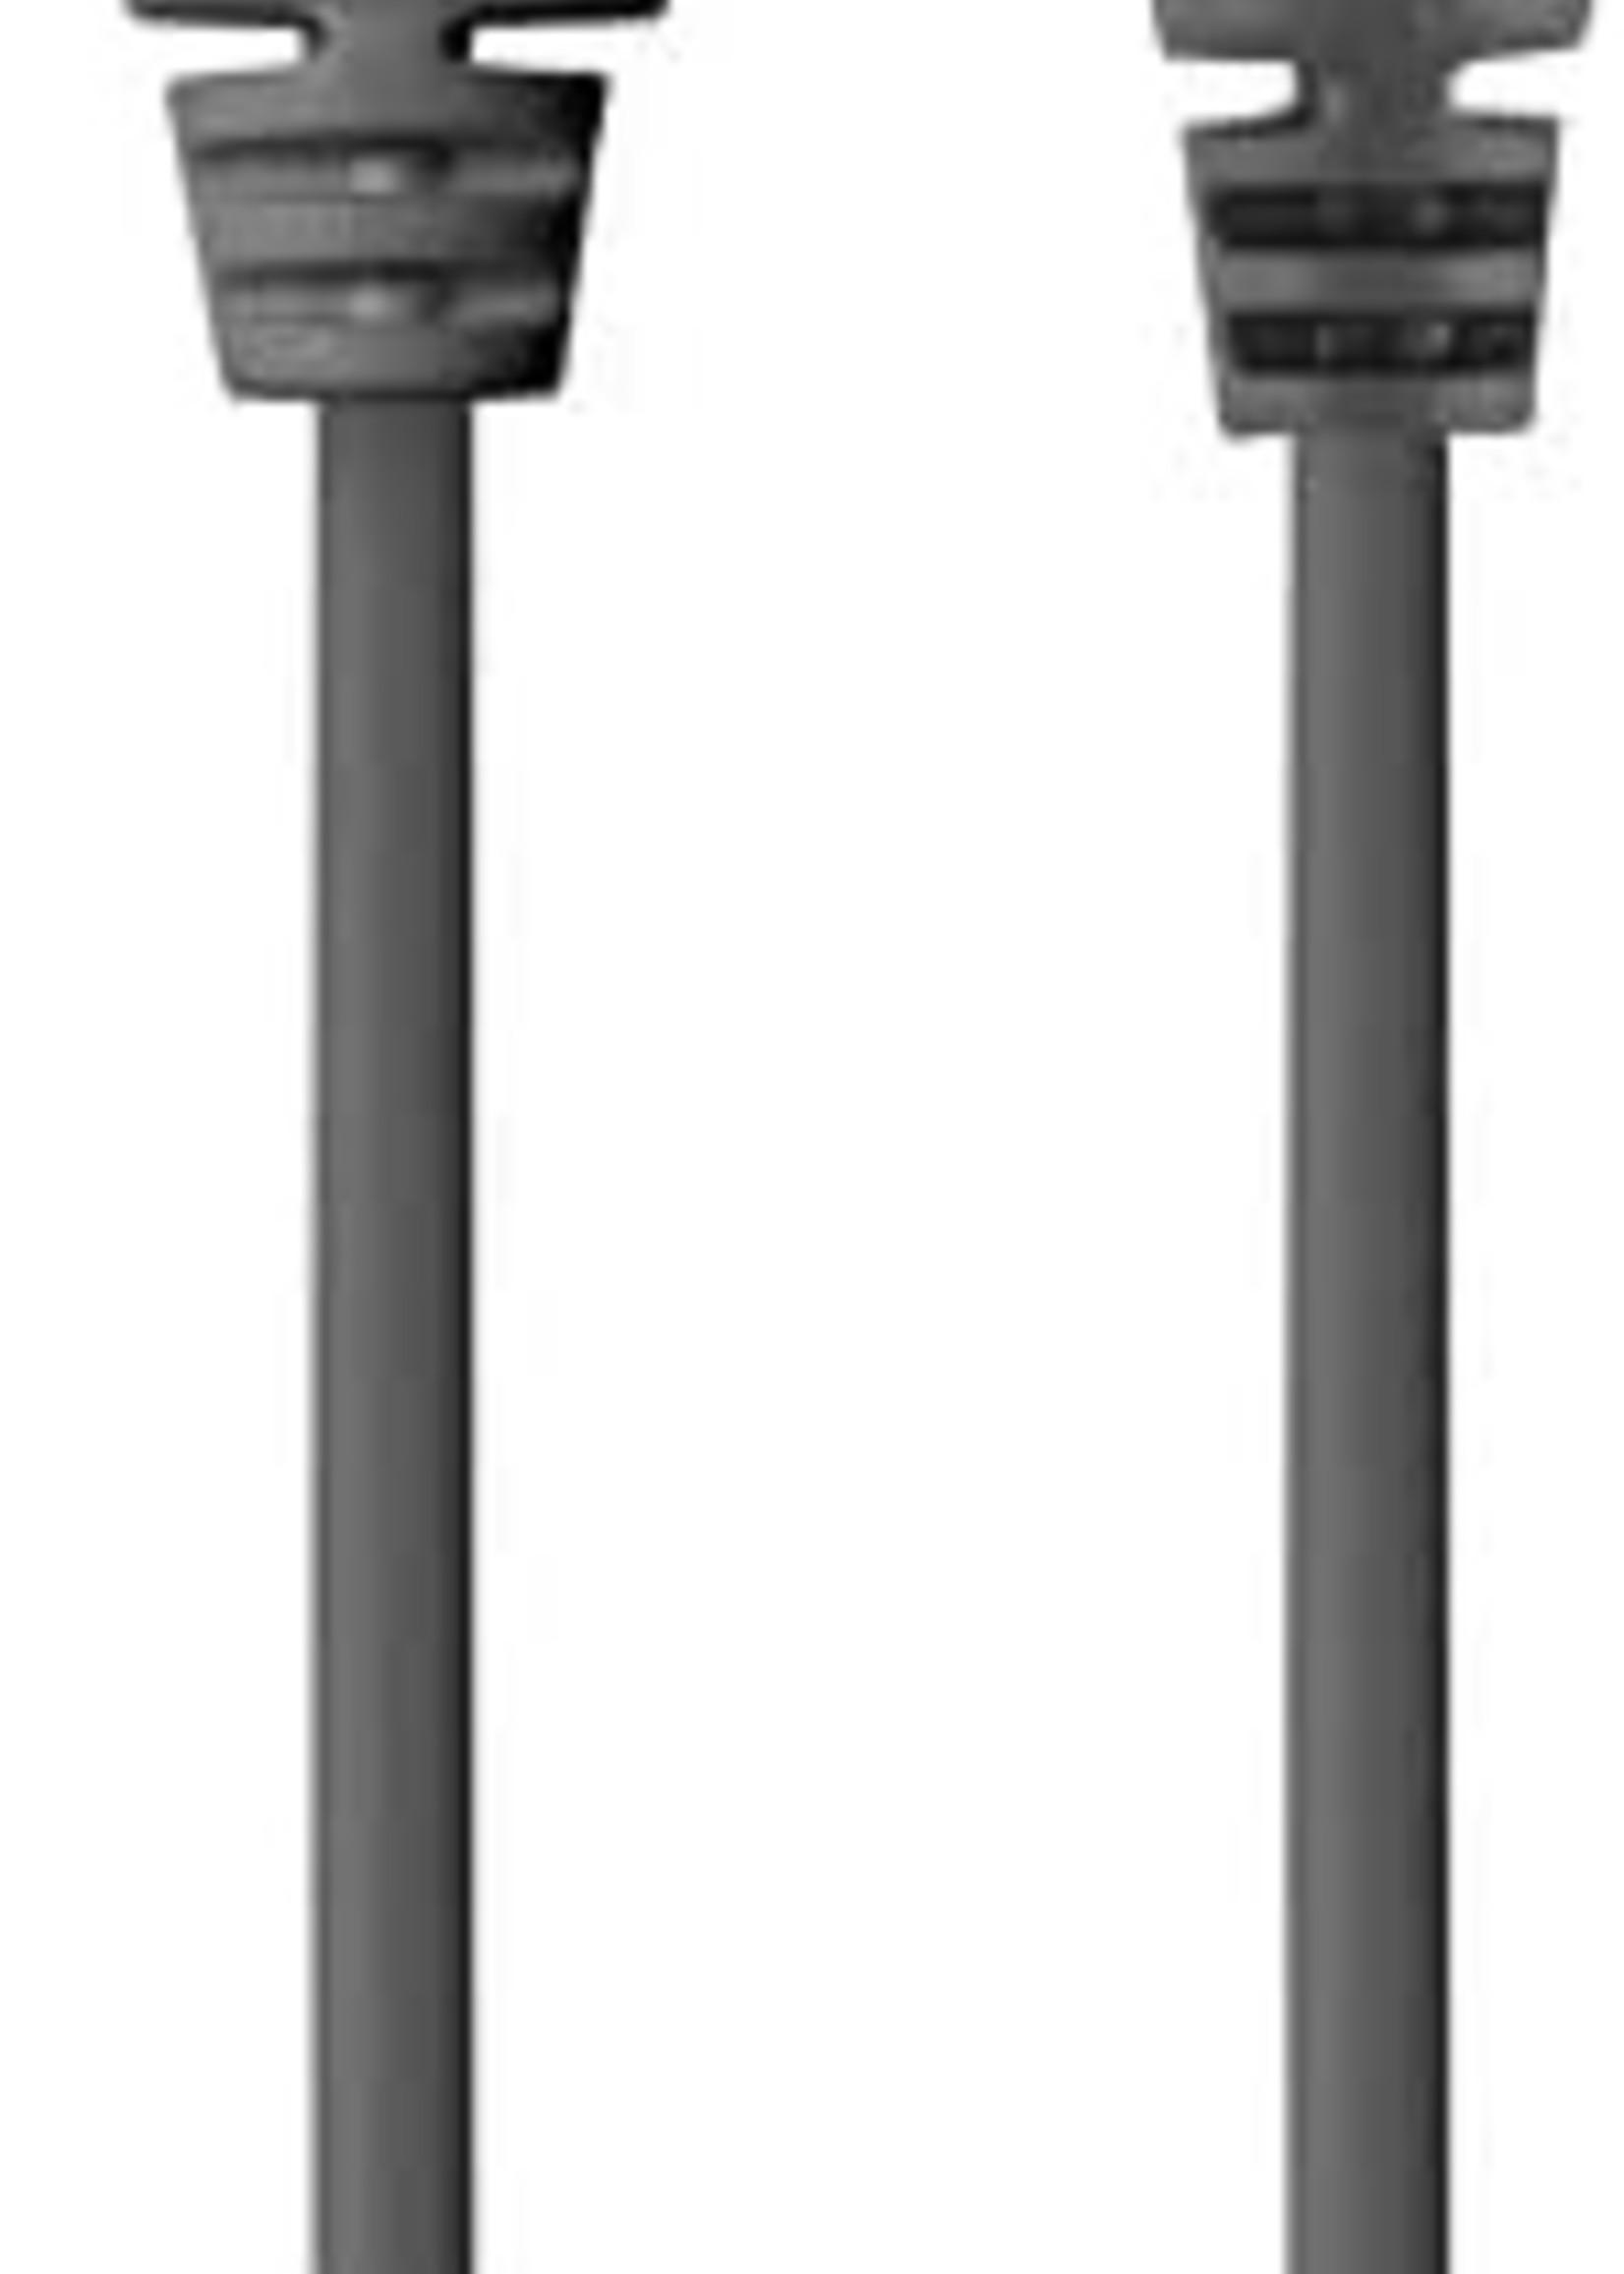 Belkin 3' Belkin Premium USB Cable